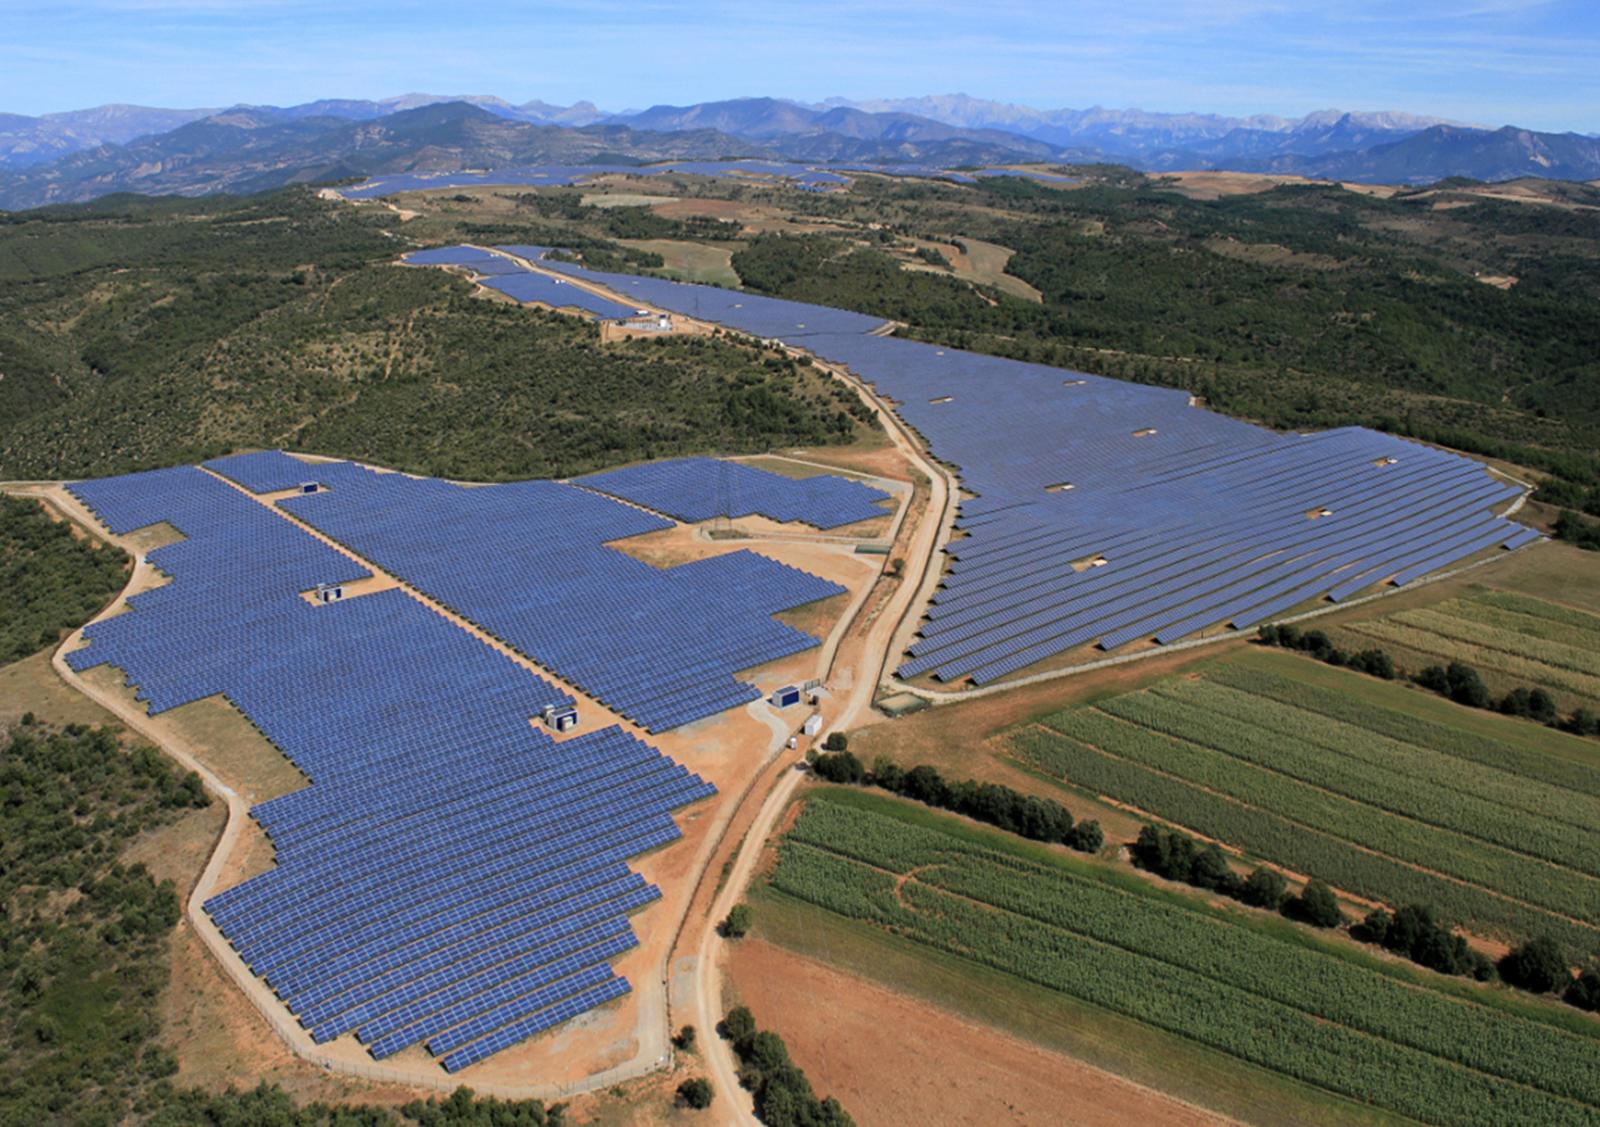 Photovoltaic Power Plants in Slovenia